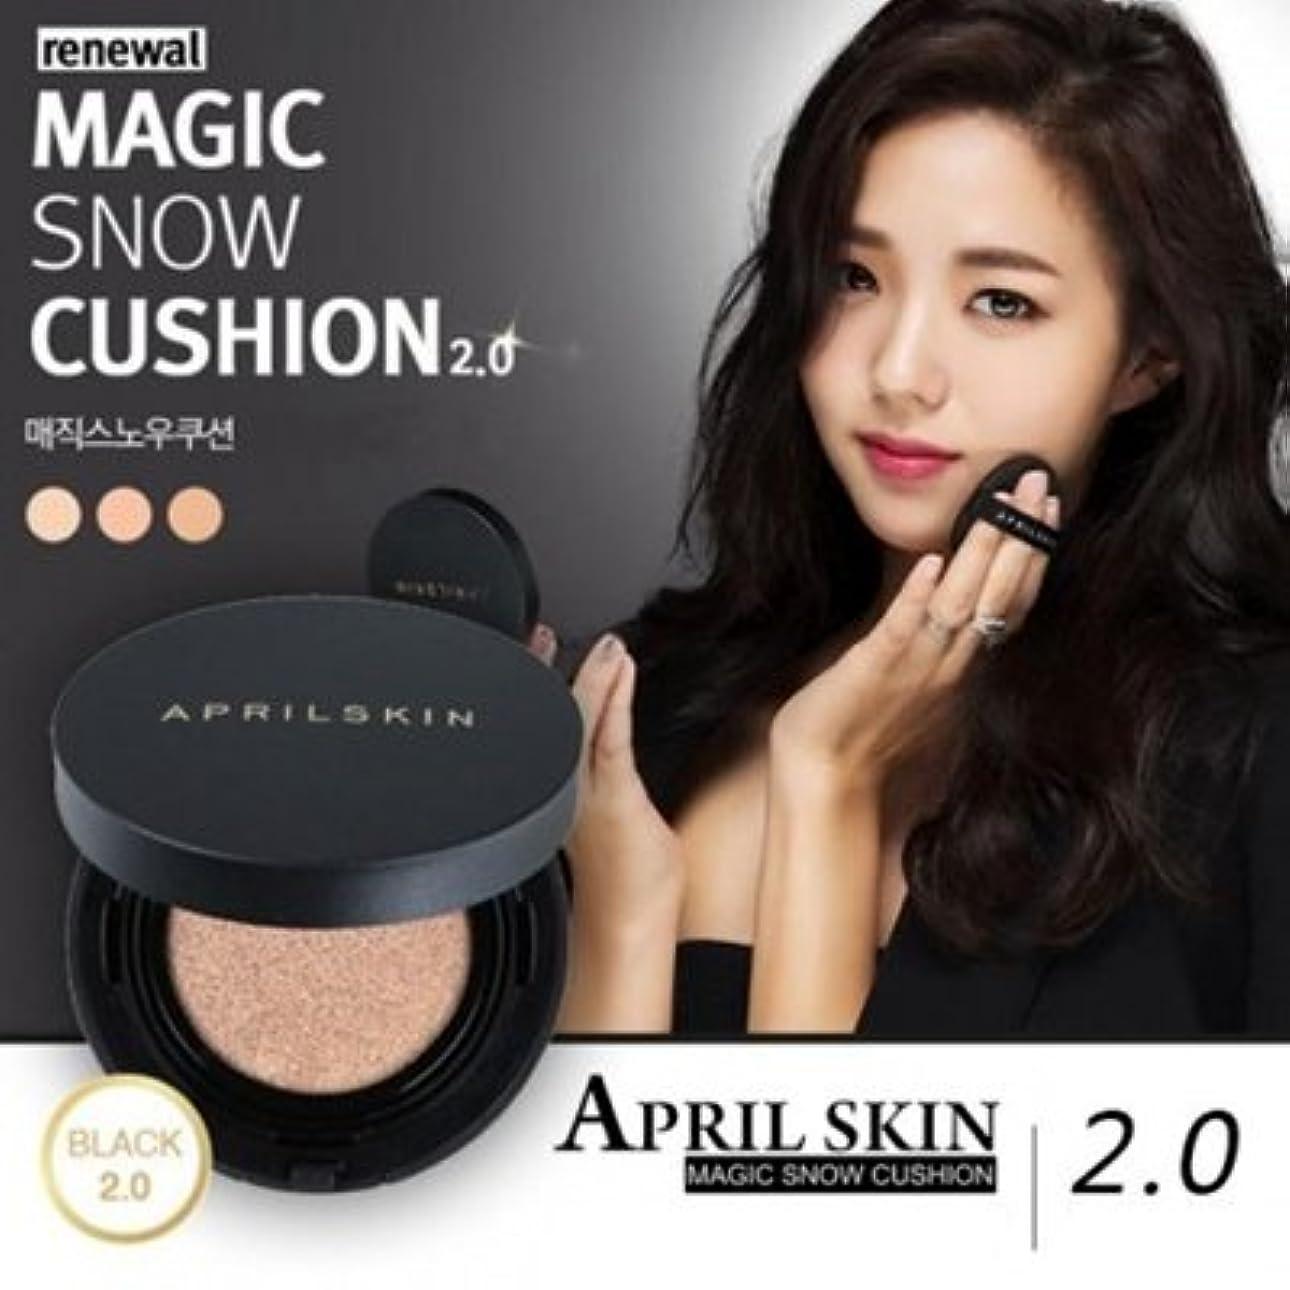 [April Skin]韓国クッション部門1位!NEW!!★Magic Snow Cushion Black 2.0★/w Gift Sample (#23 Natural Beige) [並行輸入品]